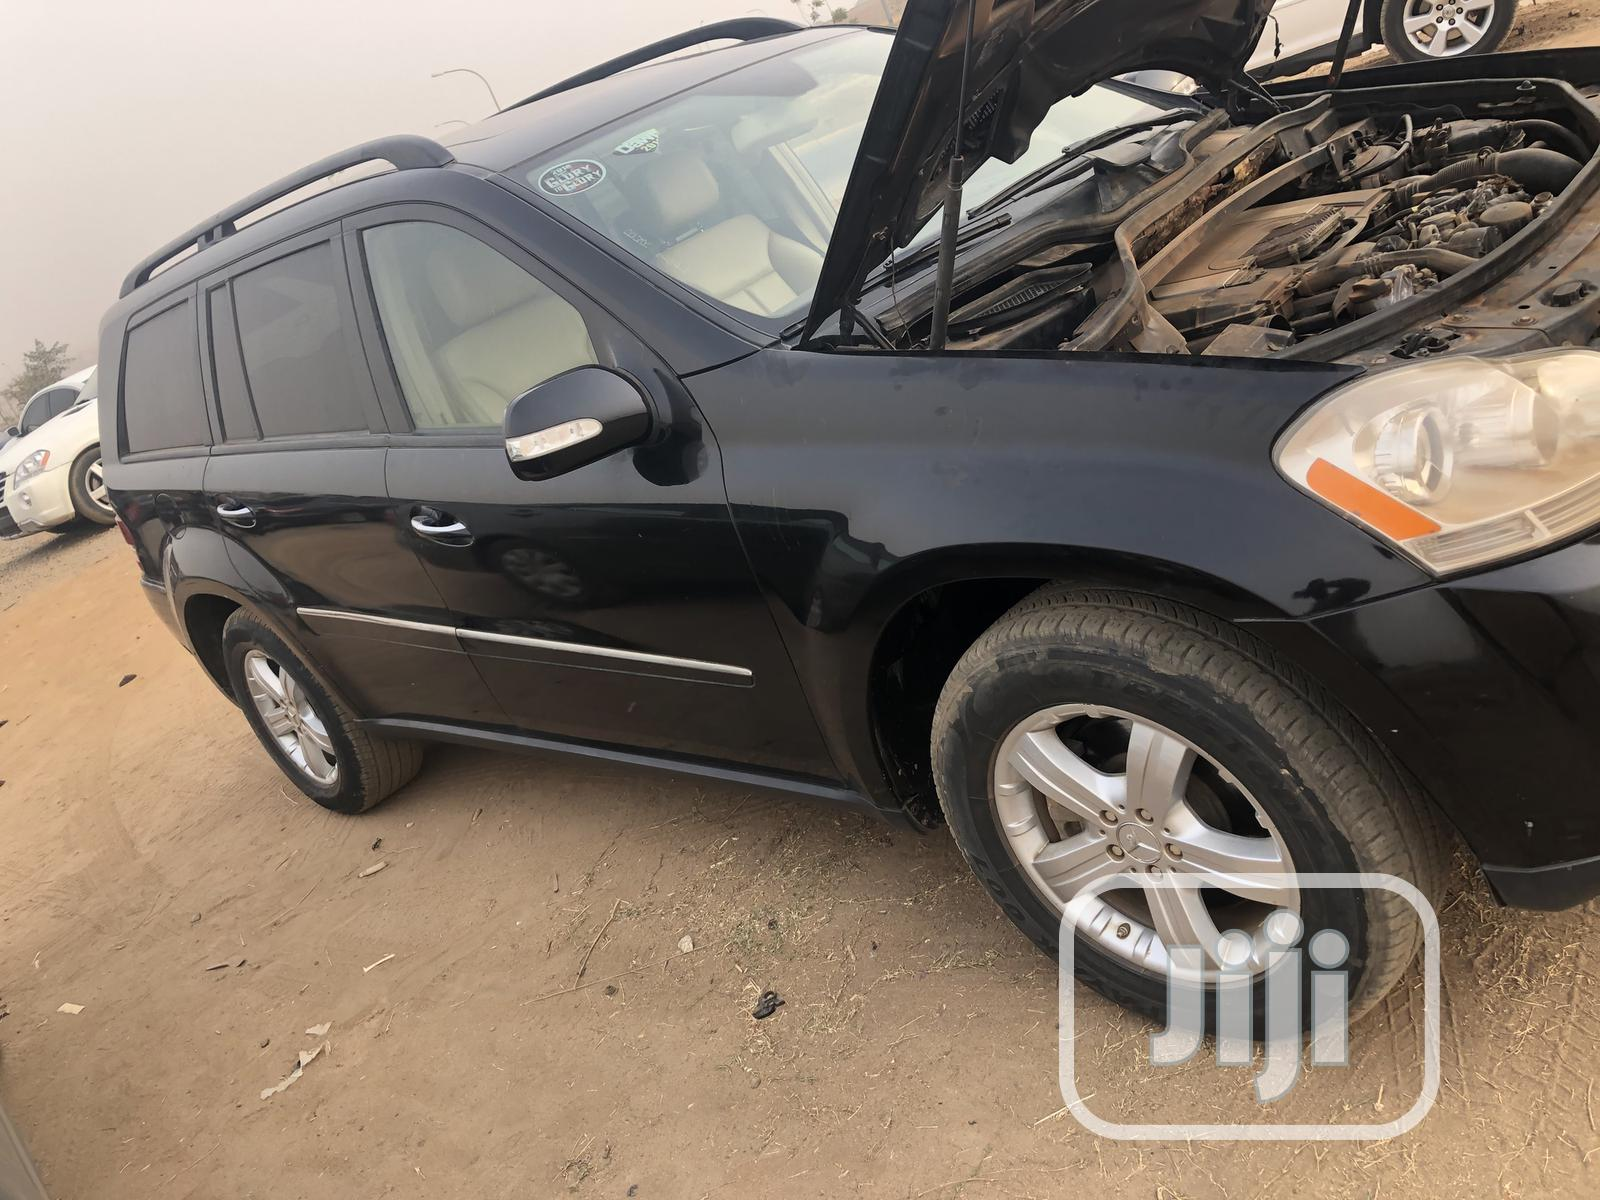 Mercedes-Benz GL Class 2007 GL 450 Black | Cars for sale in Lugbe District, Abuja (FCT) State, Nigeria